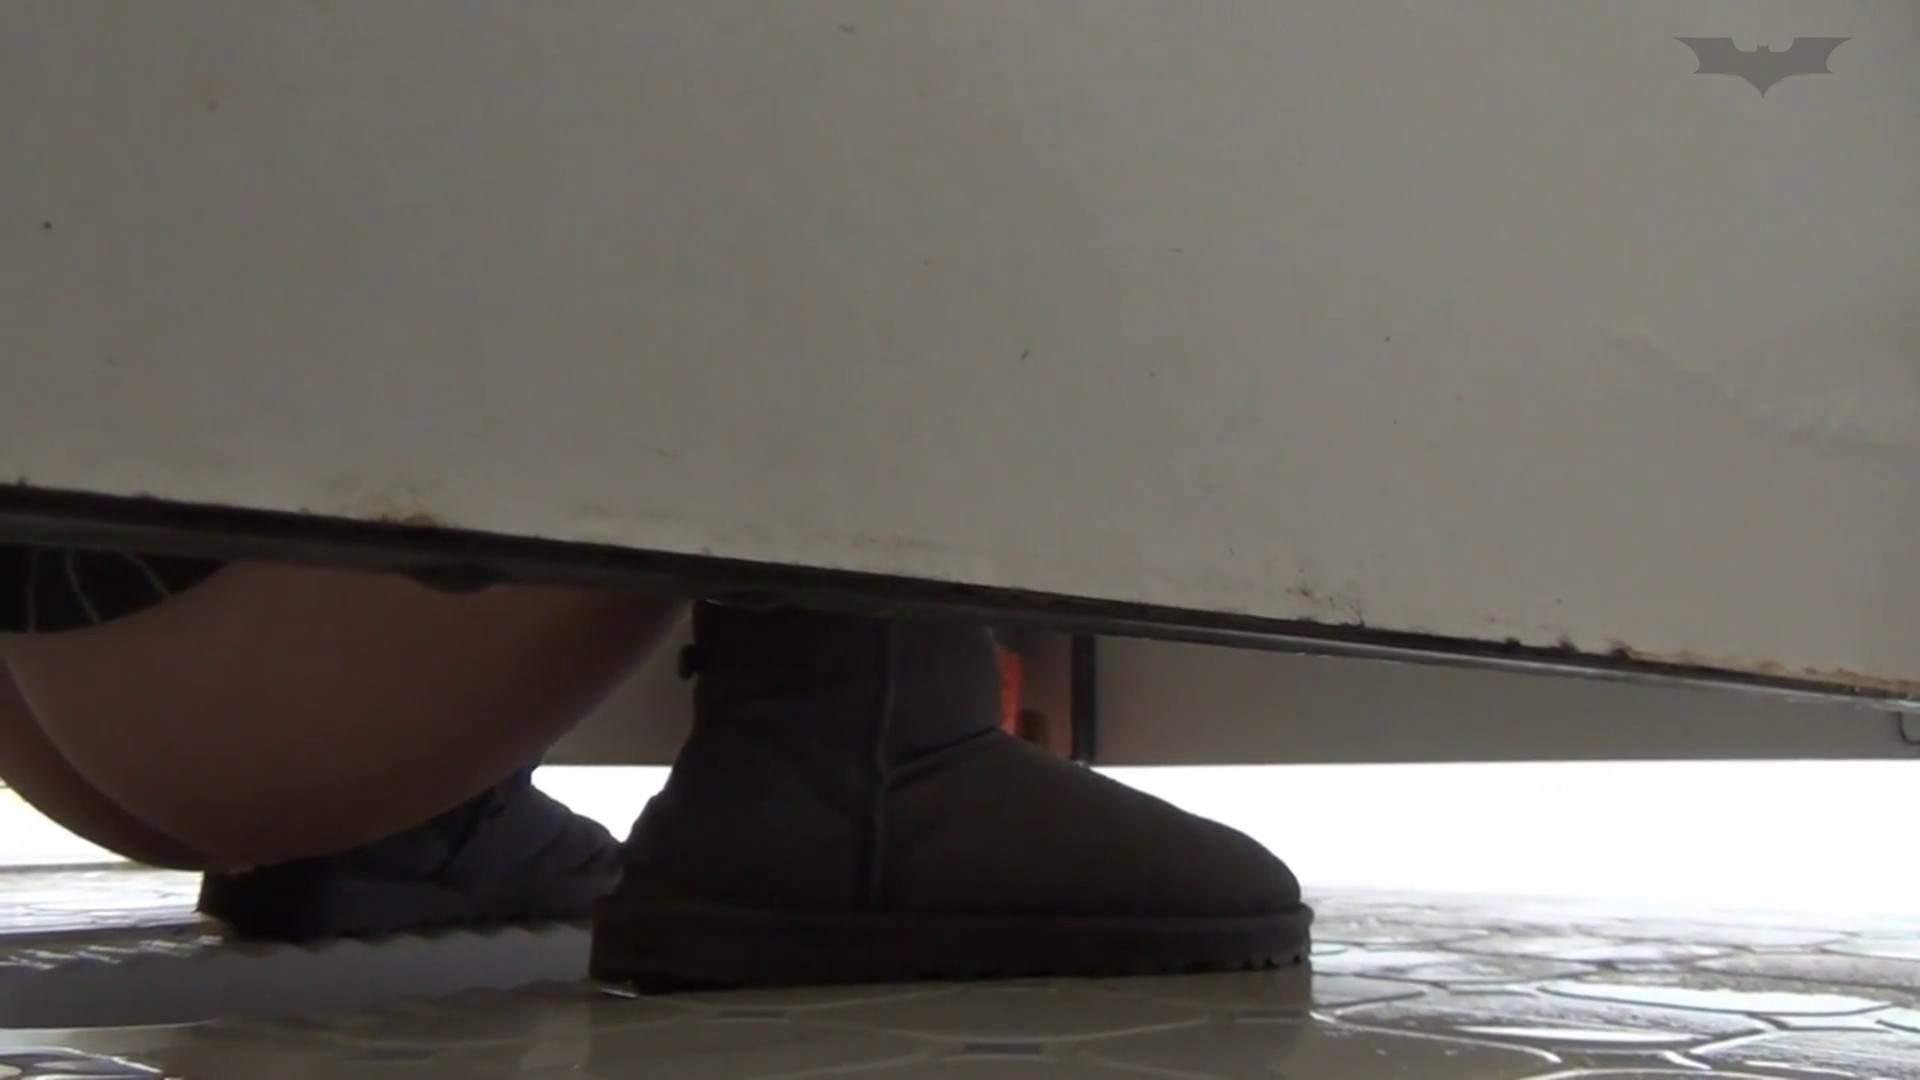 JD盗撮 美女の洗面所の秘密 Vol.55 トイレの実態 オマンコ無修正動画無料 82PIX 24